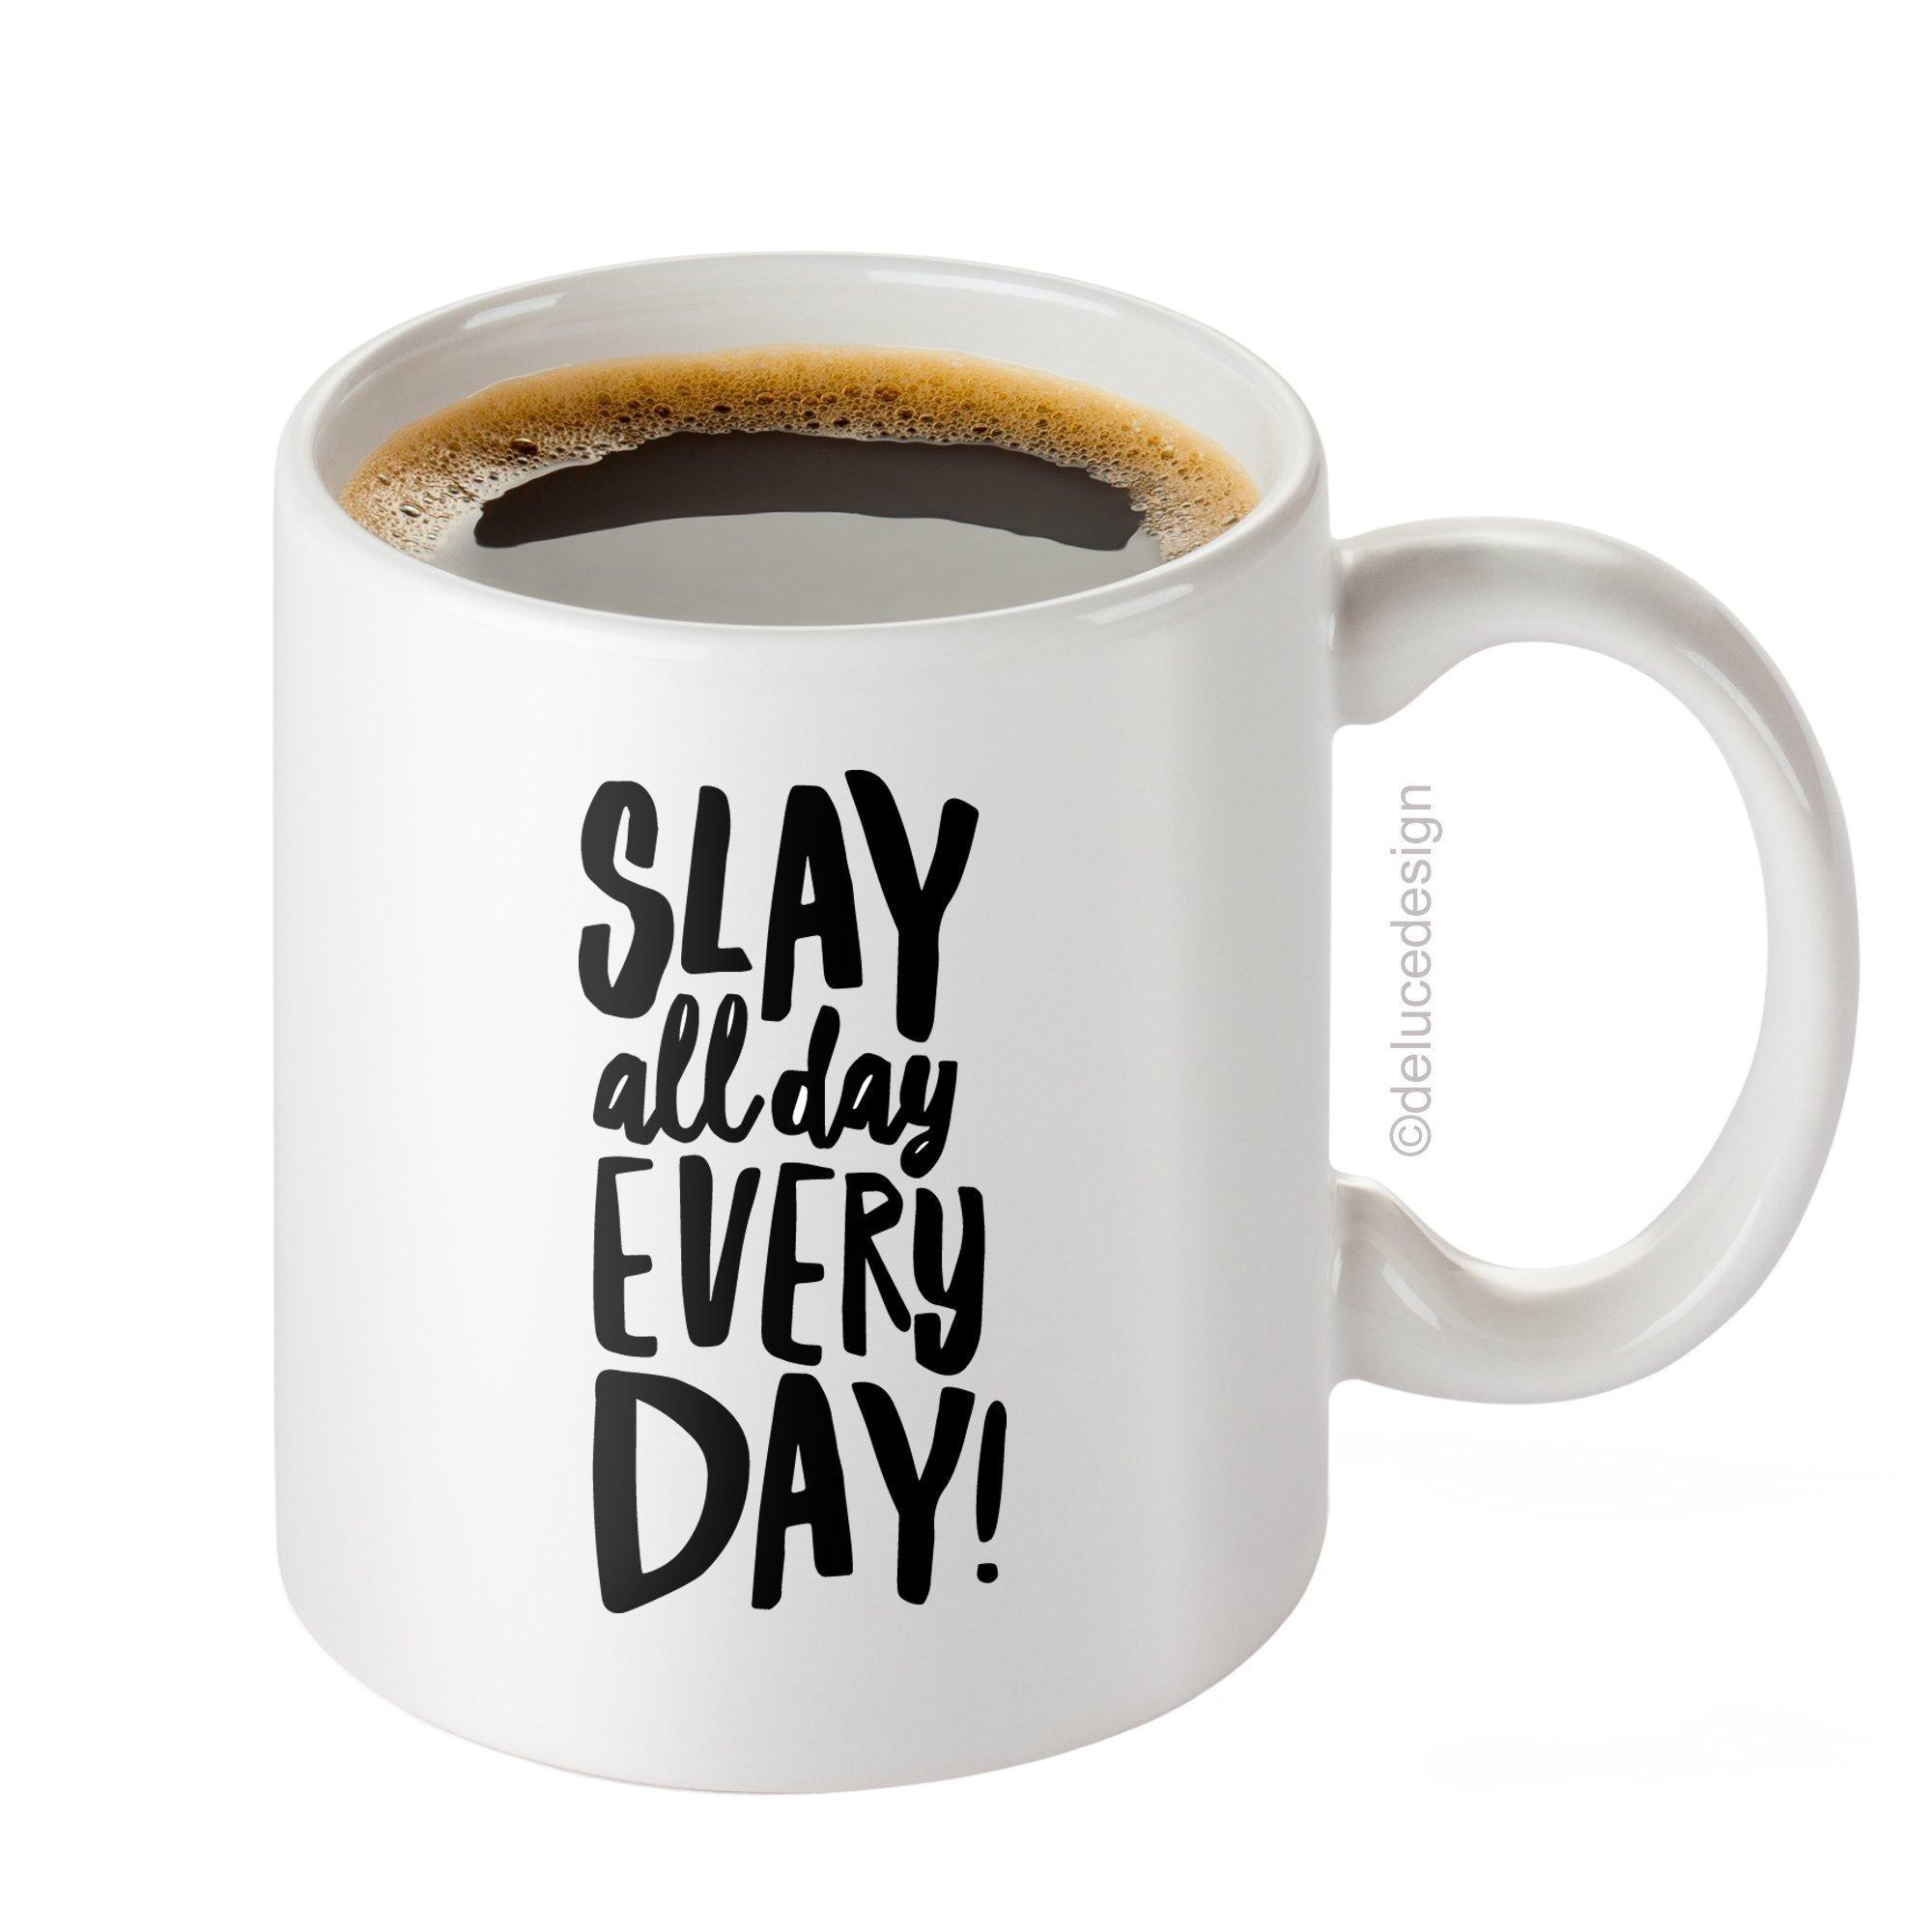 Slay All Day Every Day Mug - I Slay Coffee Mug - Funny Novelty Coffee Mug - DeLuce Design